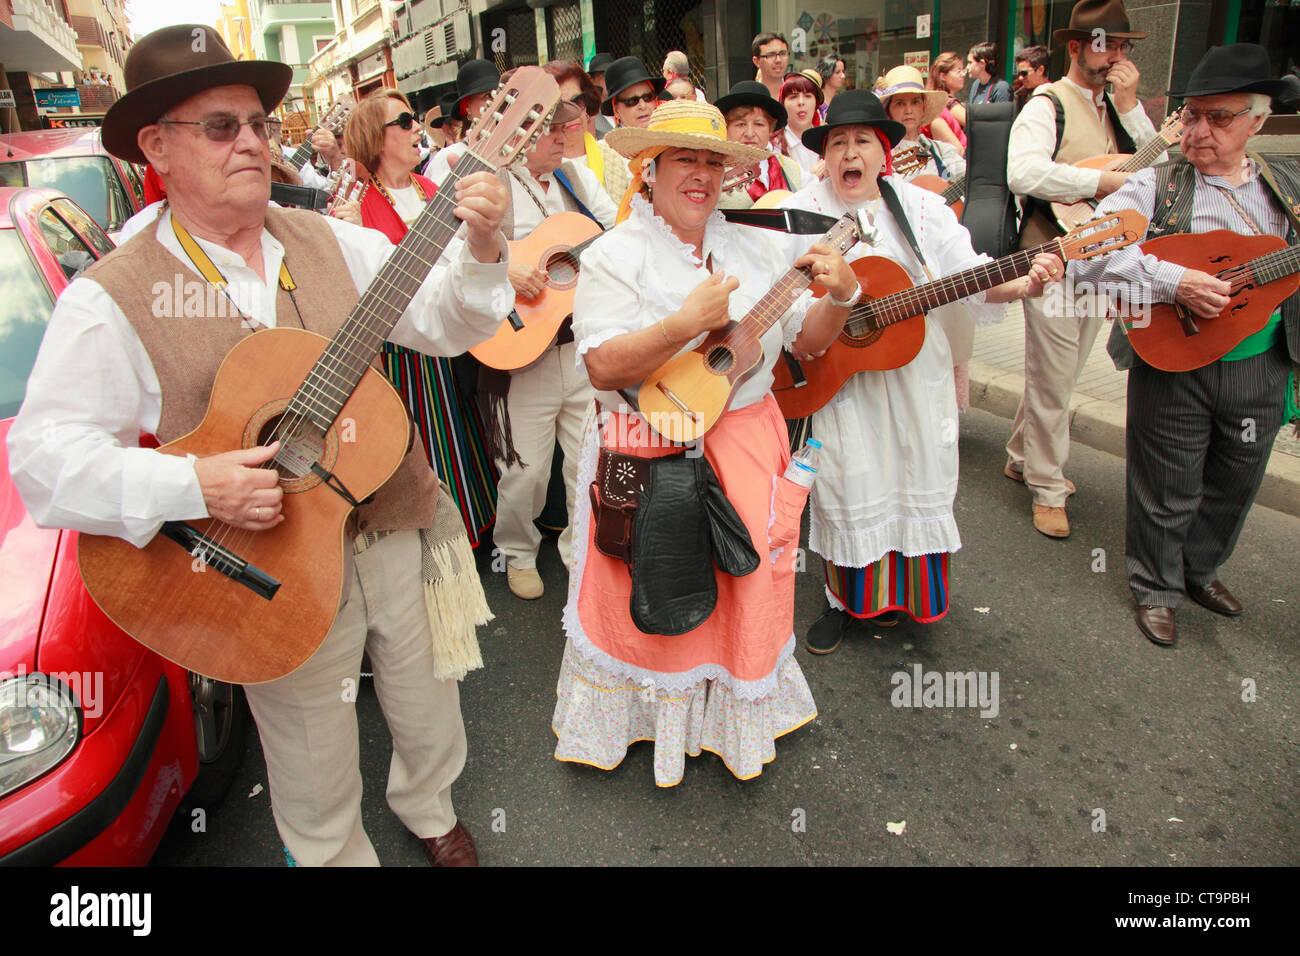 Spanien, Kanarische Inseln, Gran Canaria, Las Palmas, Dia de Las Canarias, Festival, Menschen, Tracht, Stockbild